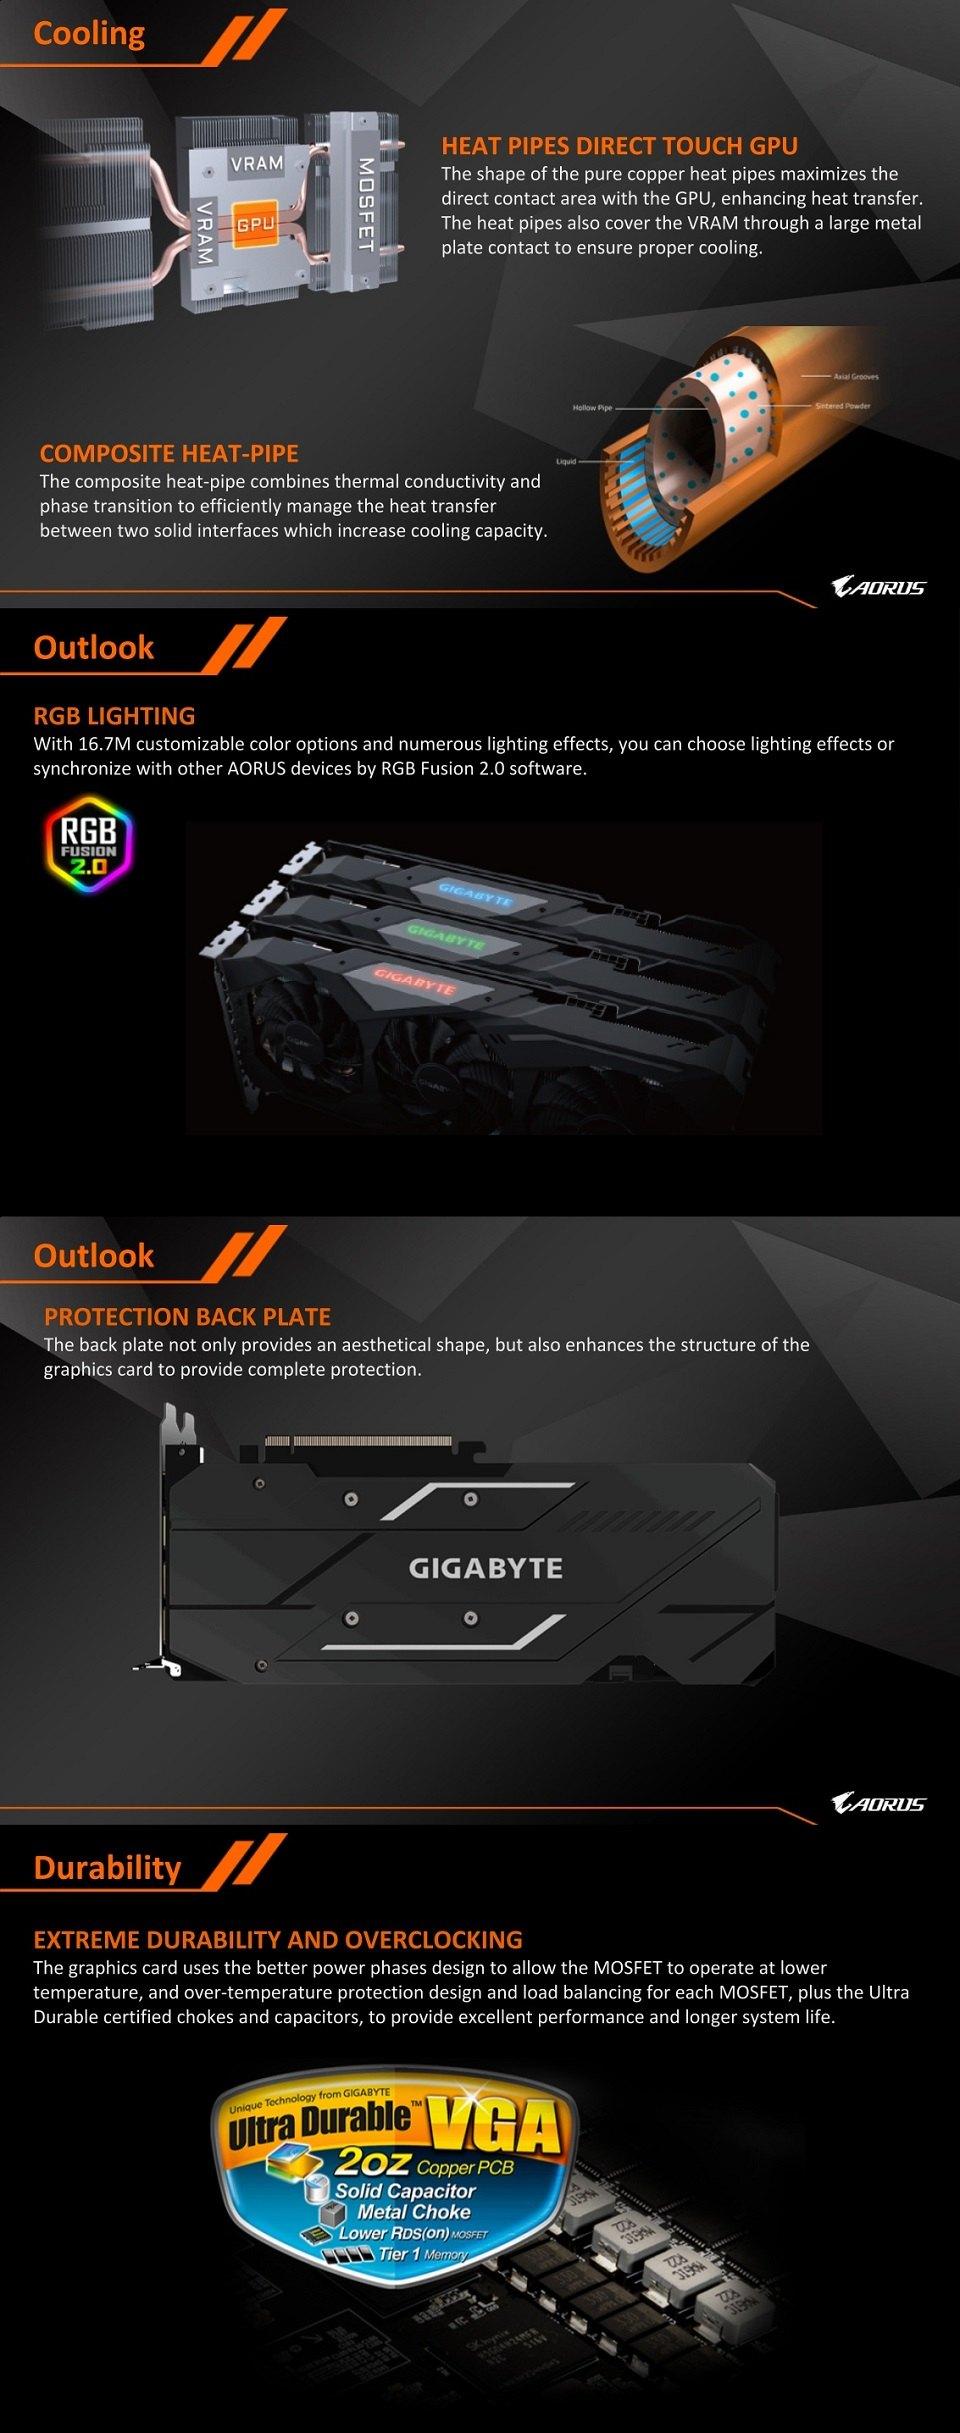 Gigabyte Radeon RX 5500 XT Gaming OC 8GB features 2